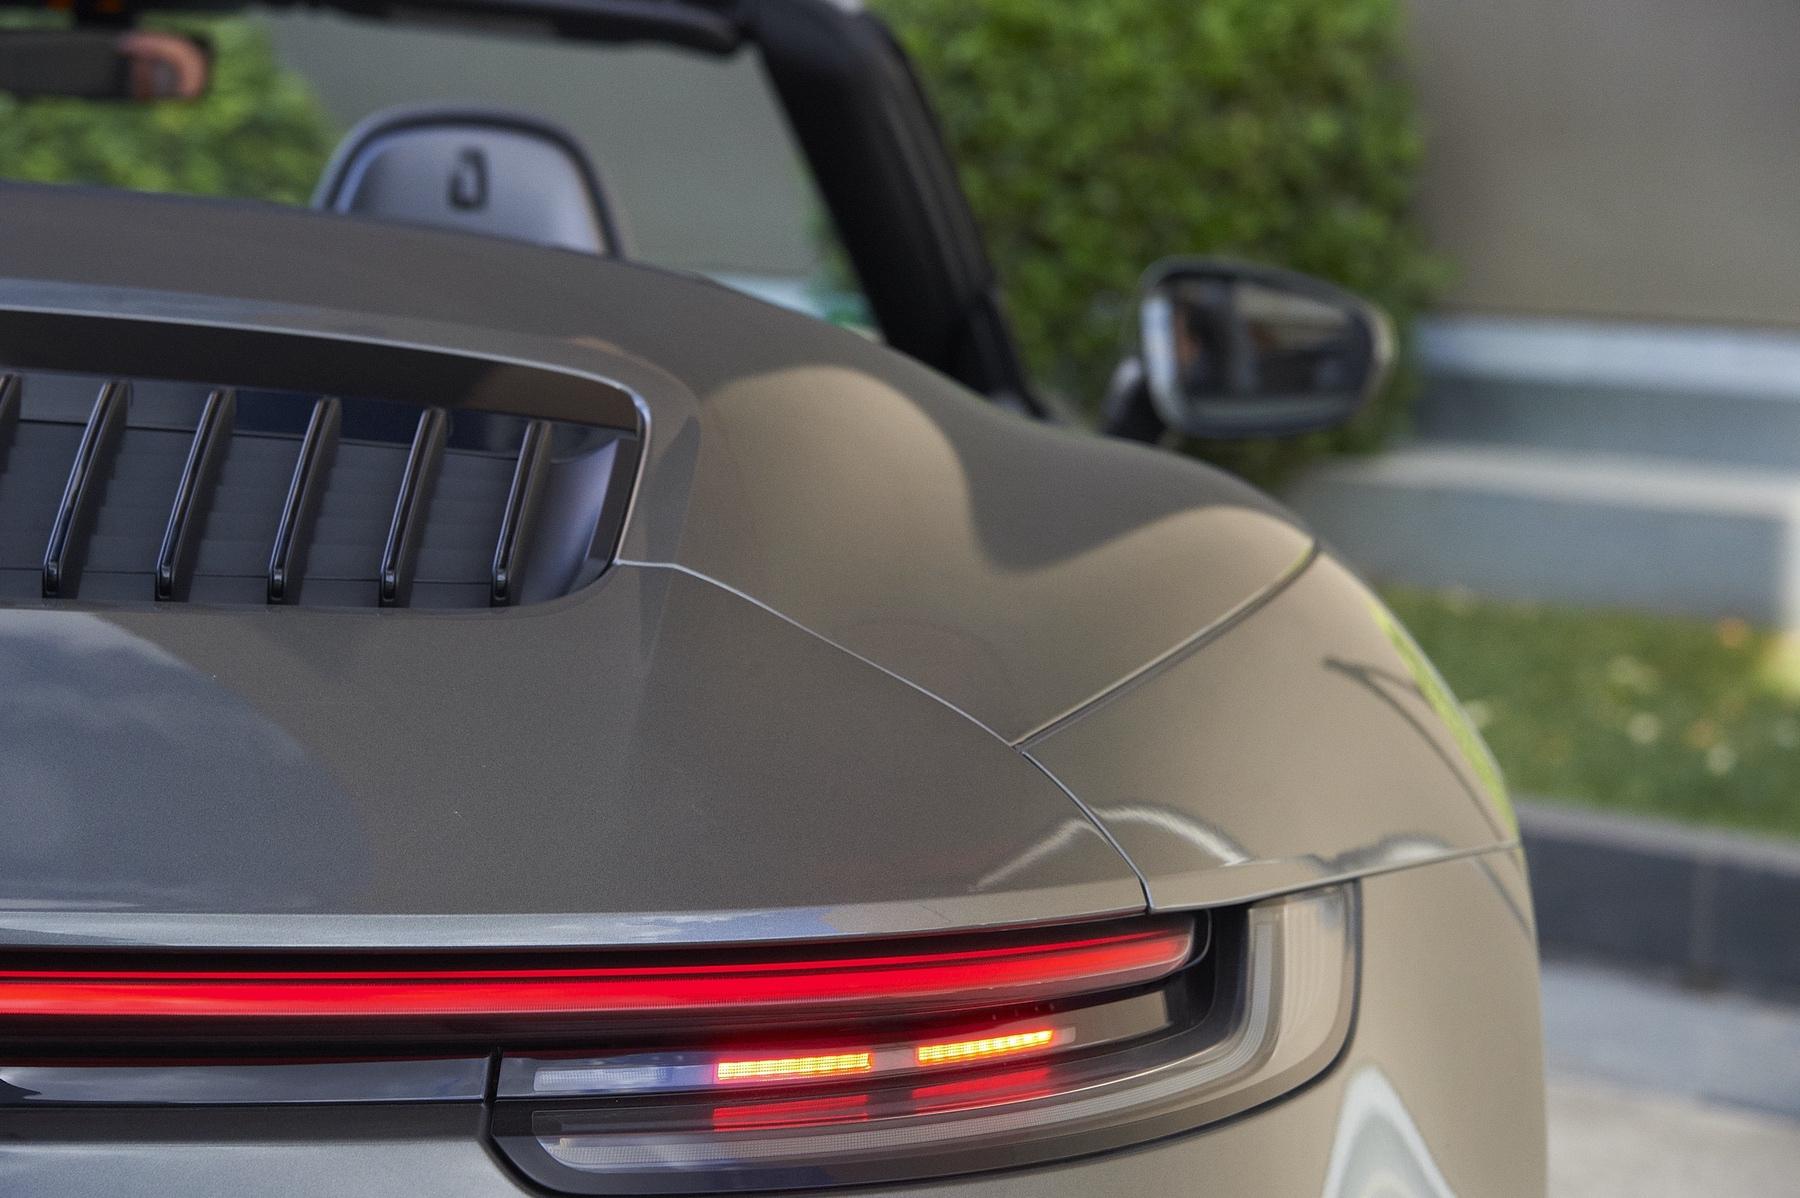 Test_Drive_Porsche_911_Athens_0168